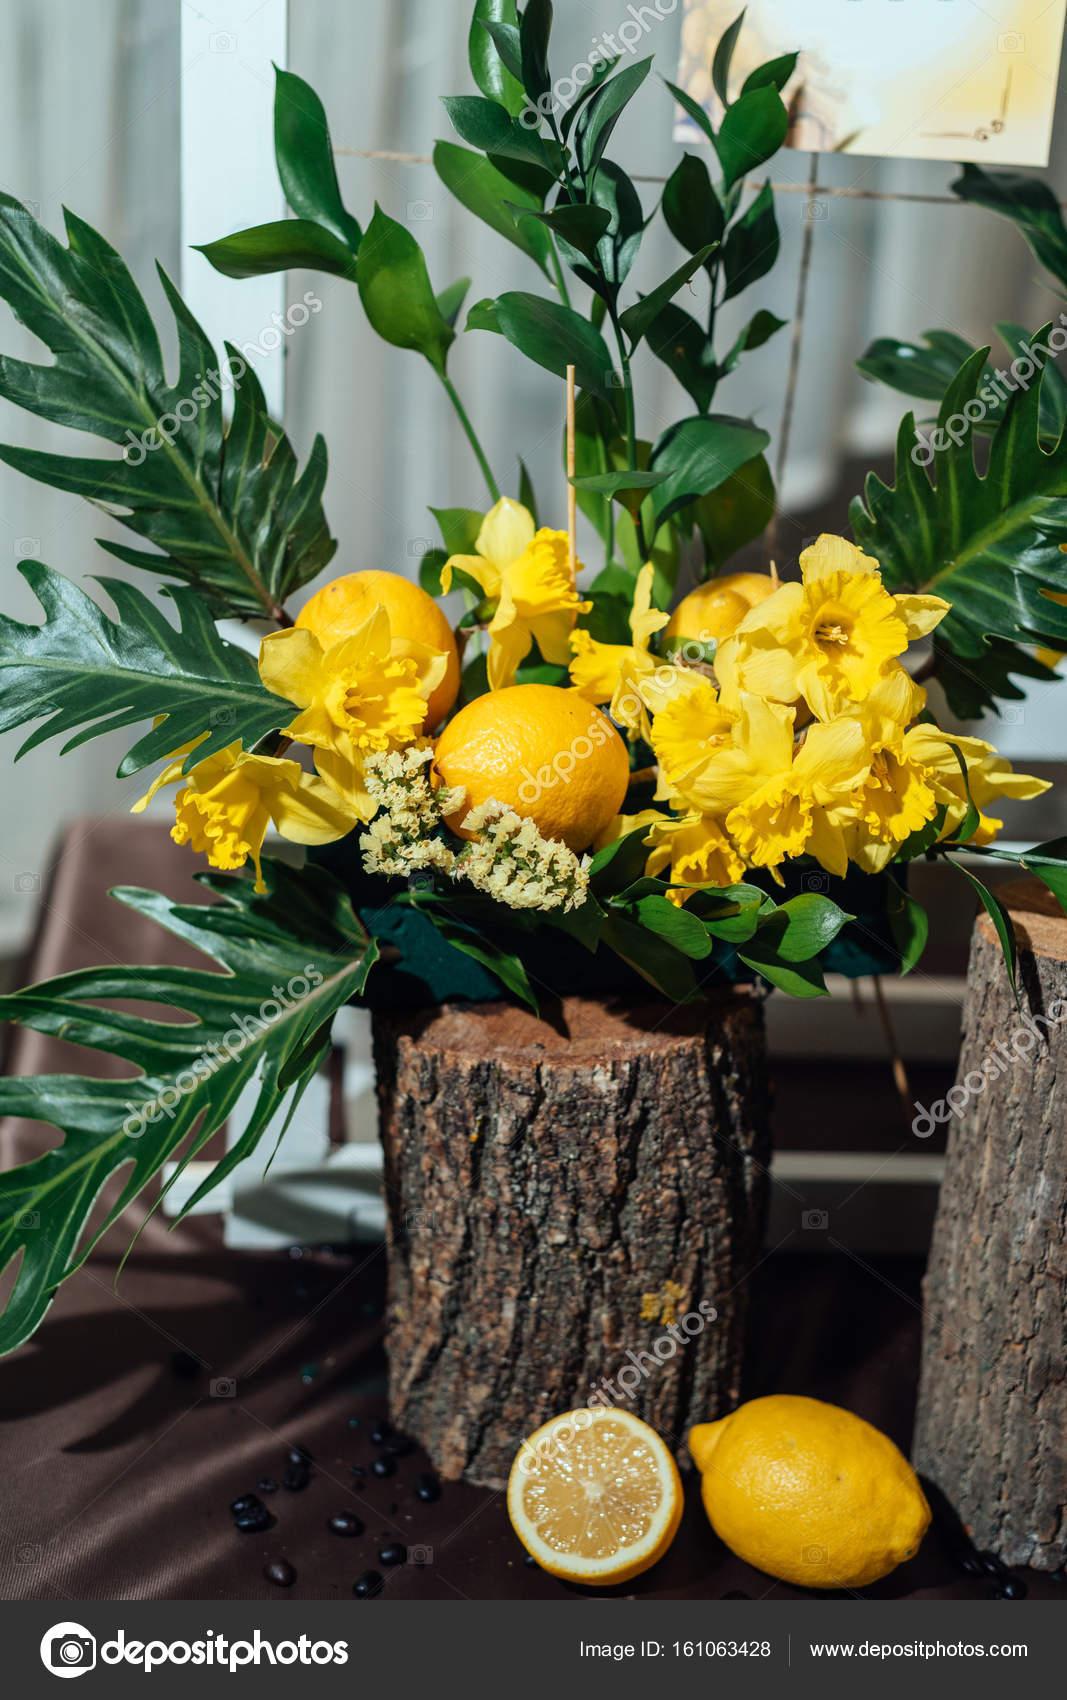 Wedding Flower Arrangements Yellow Daffodils Greenery Lemons Stumps Closeup Stock Photo Image By D Duda 161063428